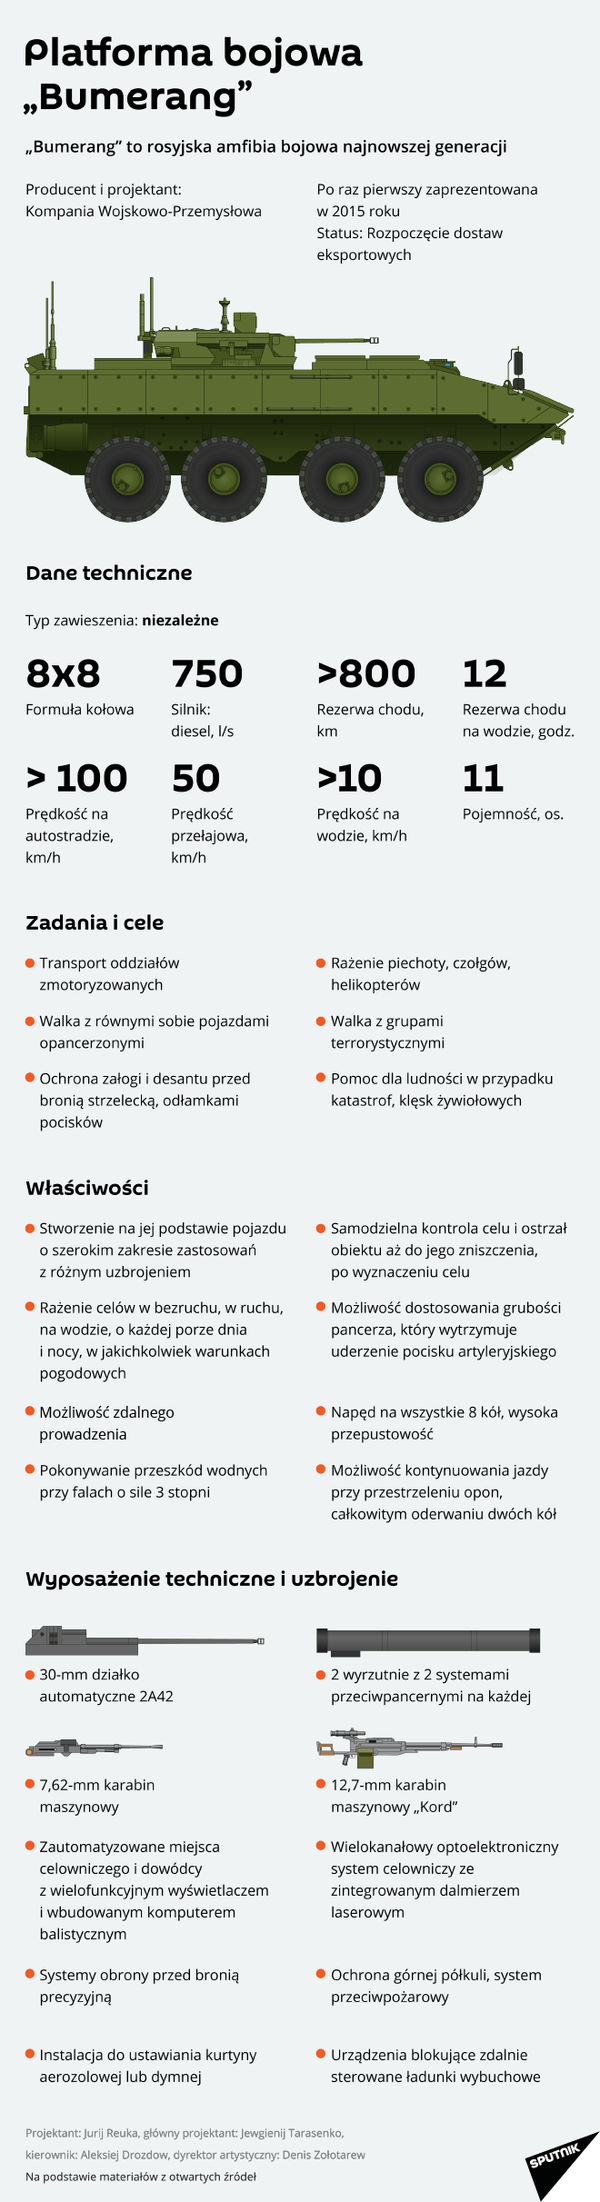 Platforma bojowa Bumerang - Sputnik Polska